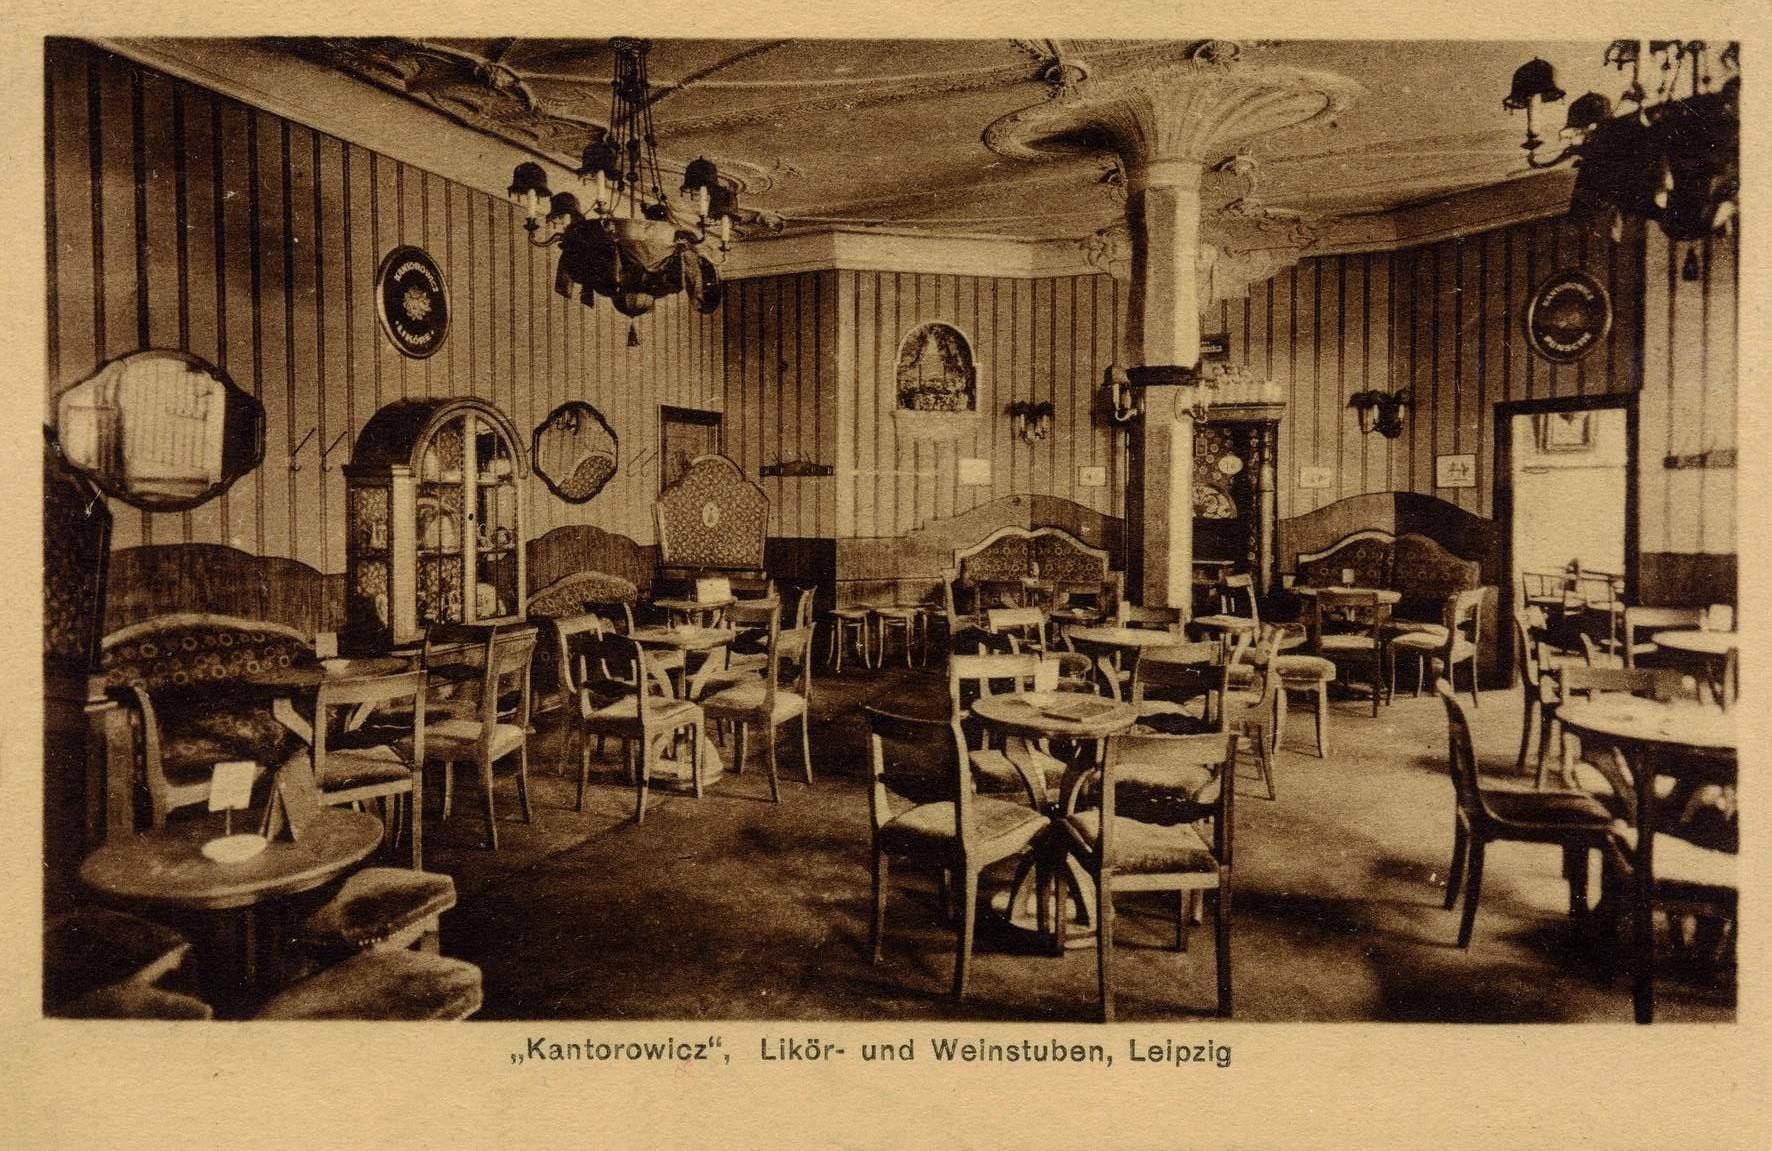 Kantorowicz Likörstube Leipzig, © Stephan Becker, Brüssow